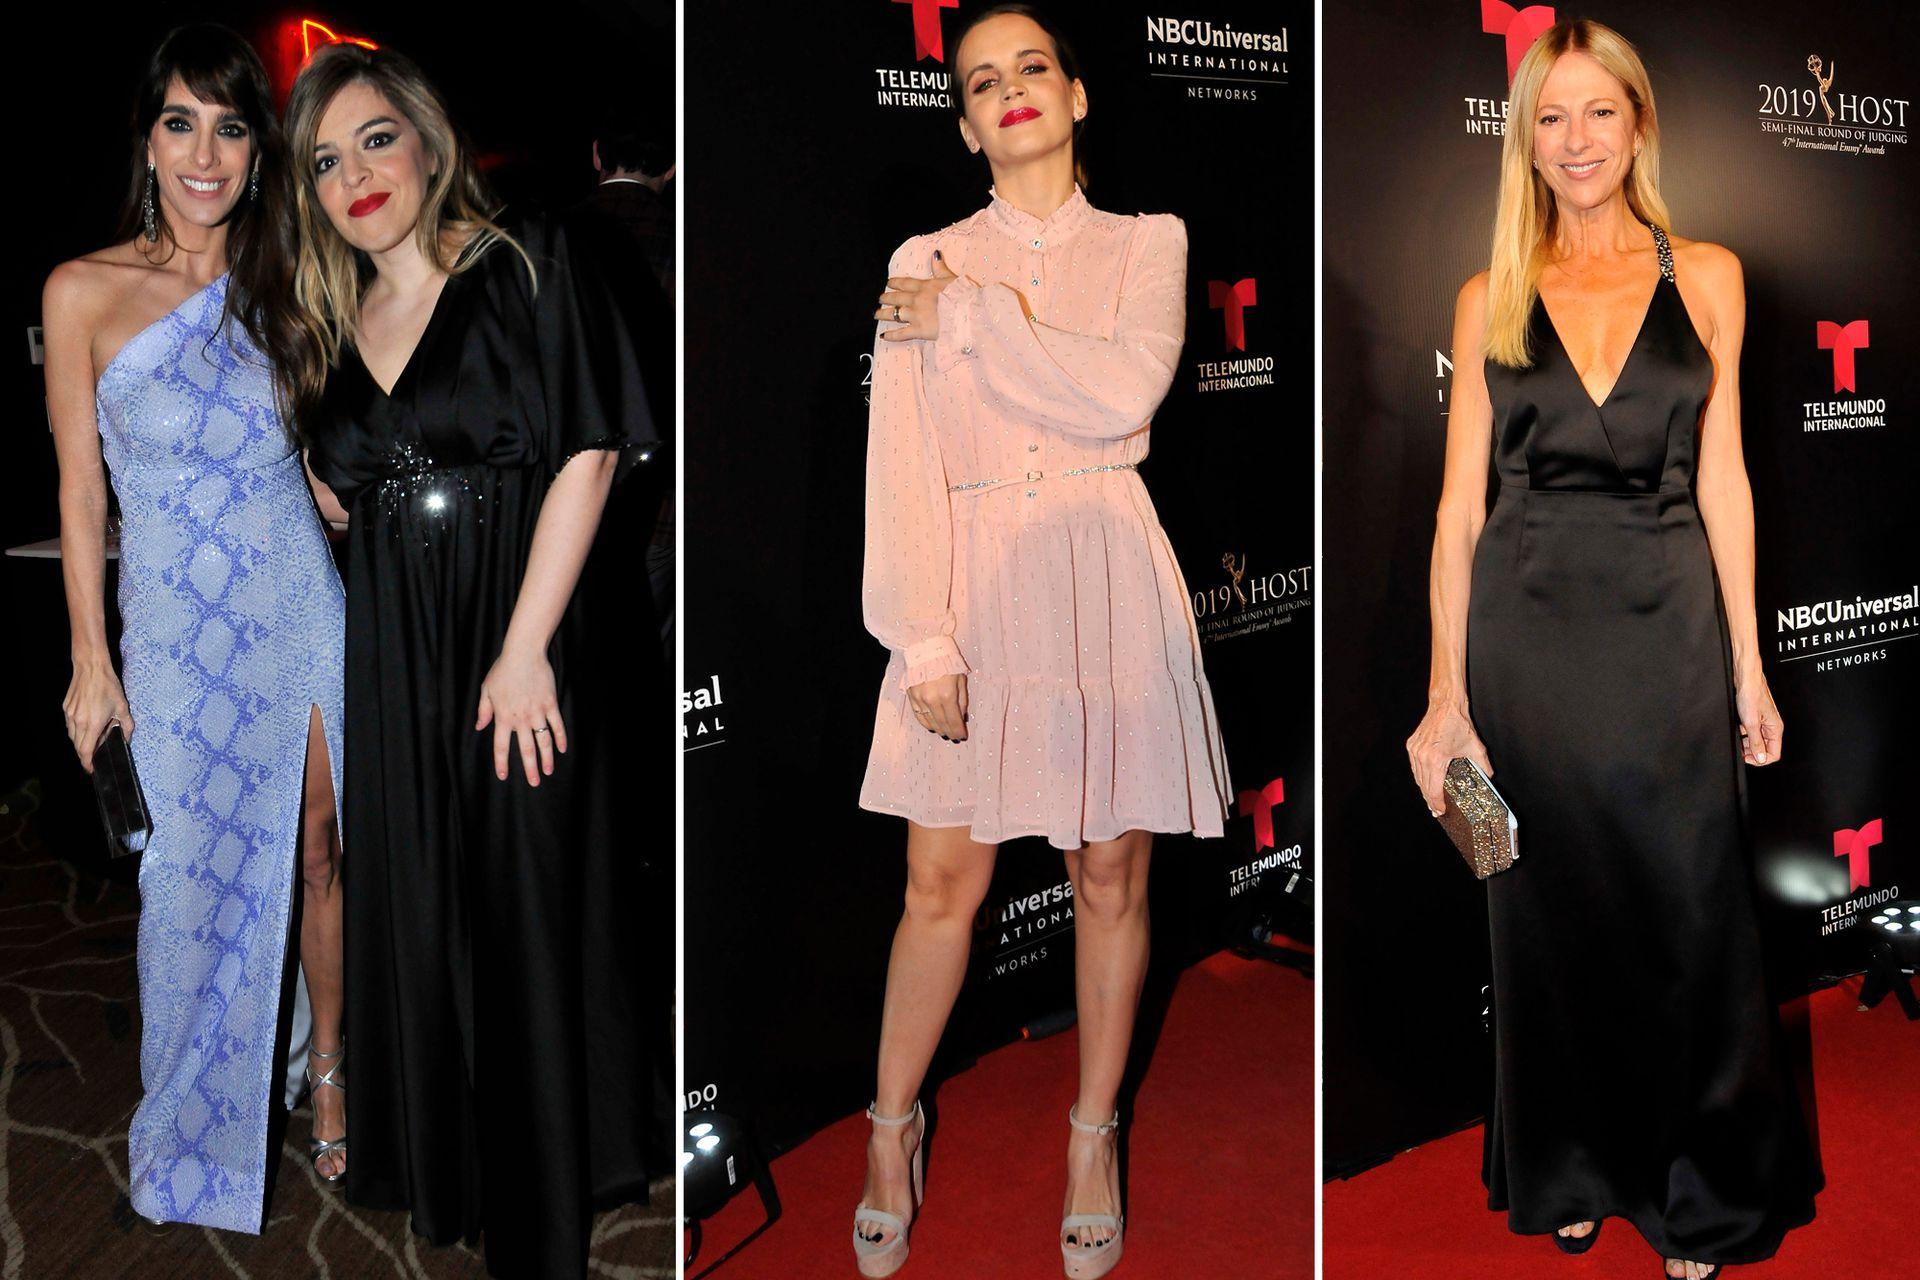 Cuatro looks: Gabriela Sari, Dalma Maradona, Sabrina Garciarena y Claudia Fontán